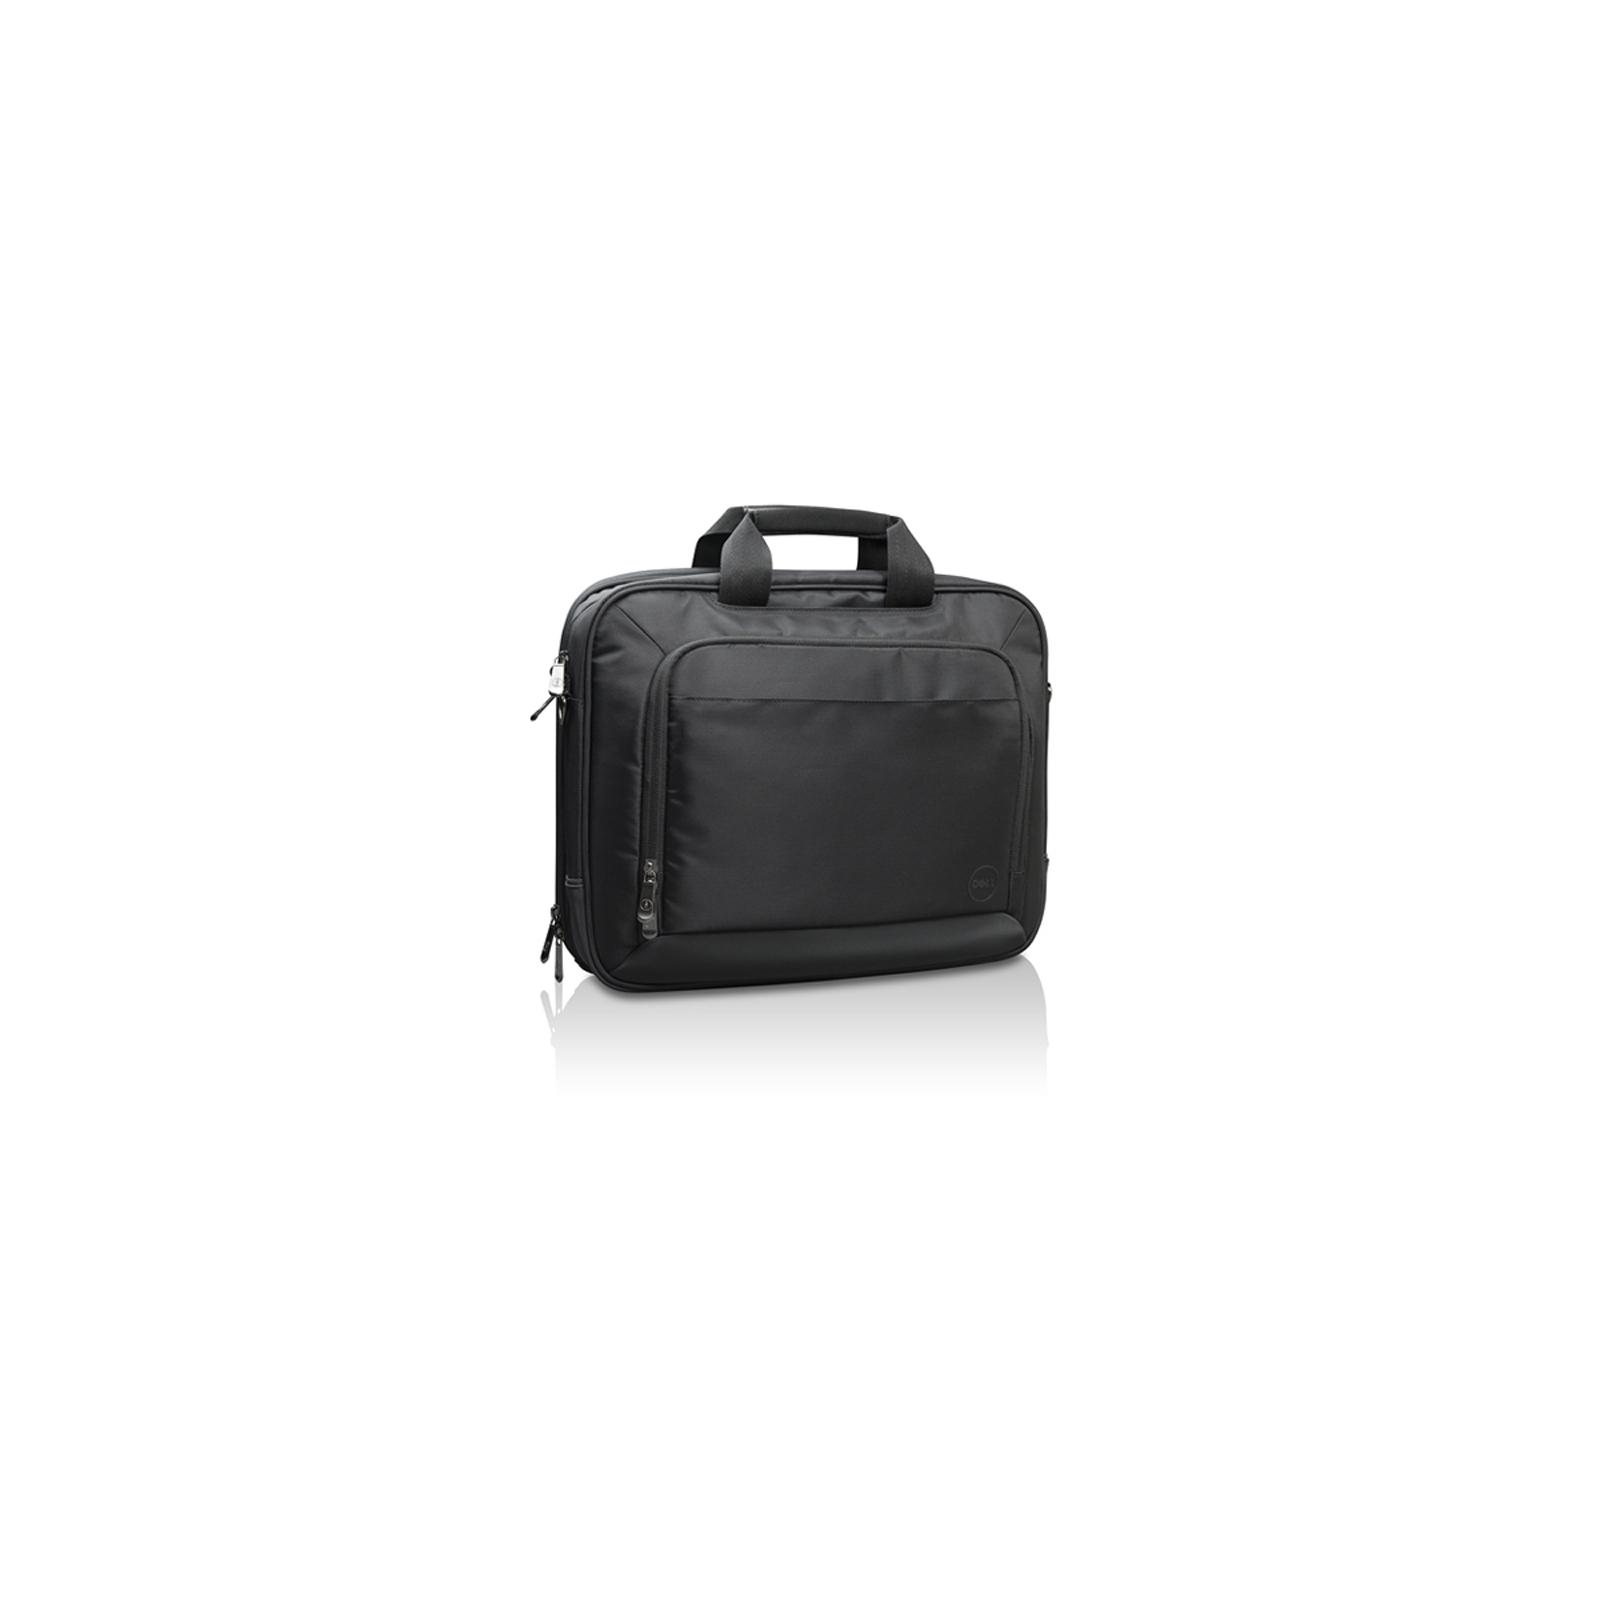 "Сумка для ноутбука Dell 15.6"" Topload (460-BBLR) изображение 2"